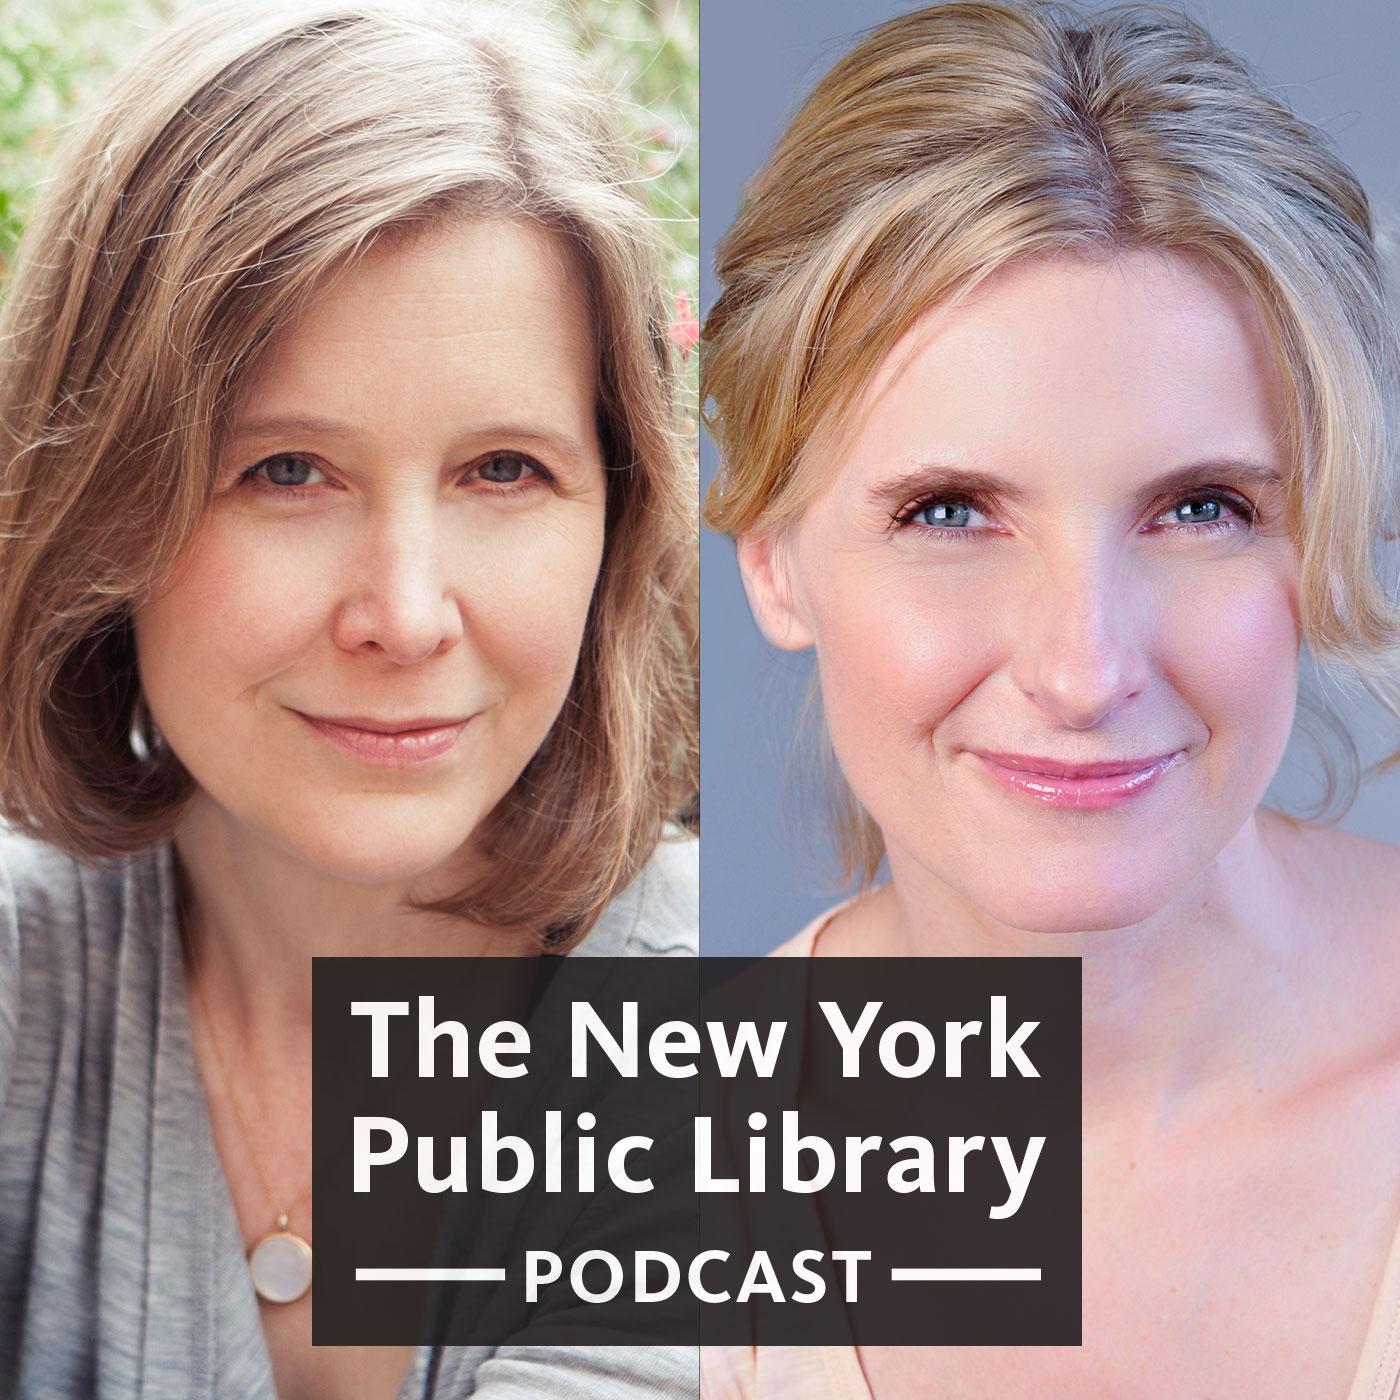 Ann Patchett & Elizabeth Gilbert on Writing